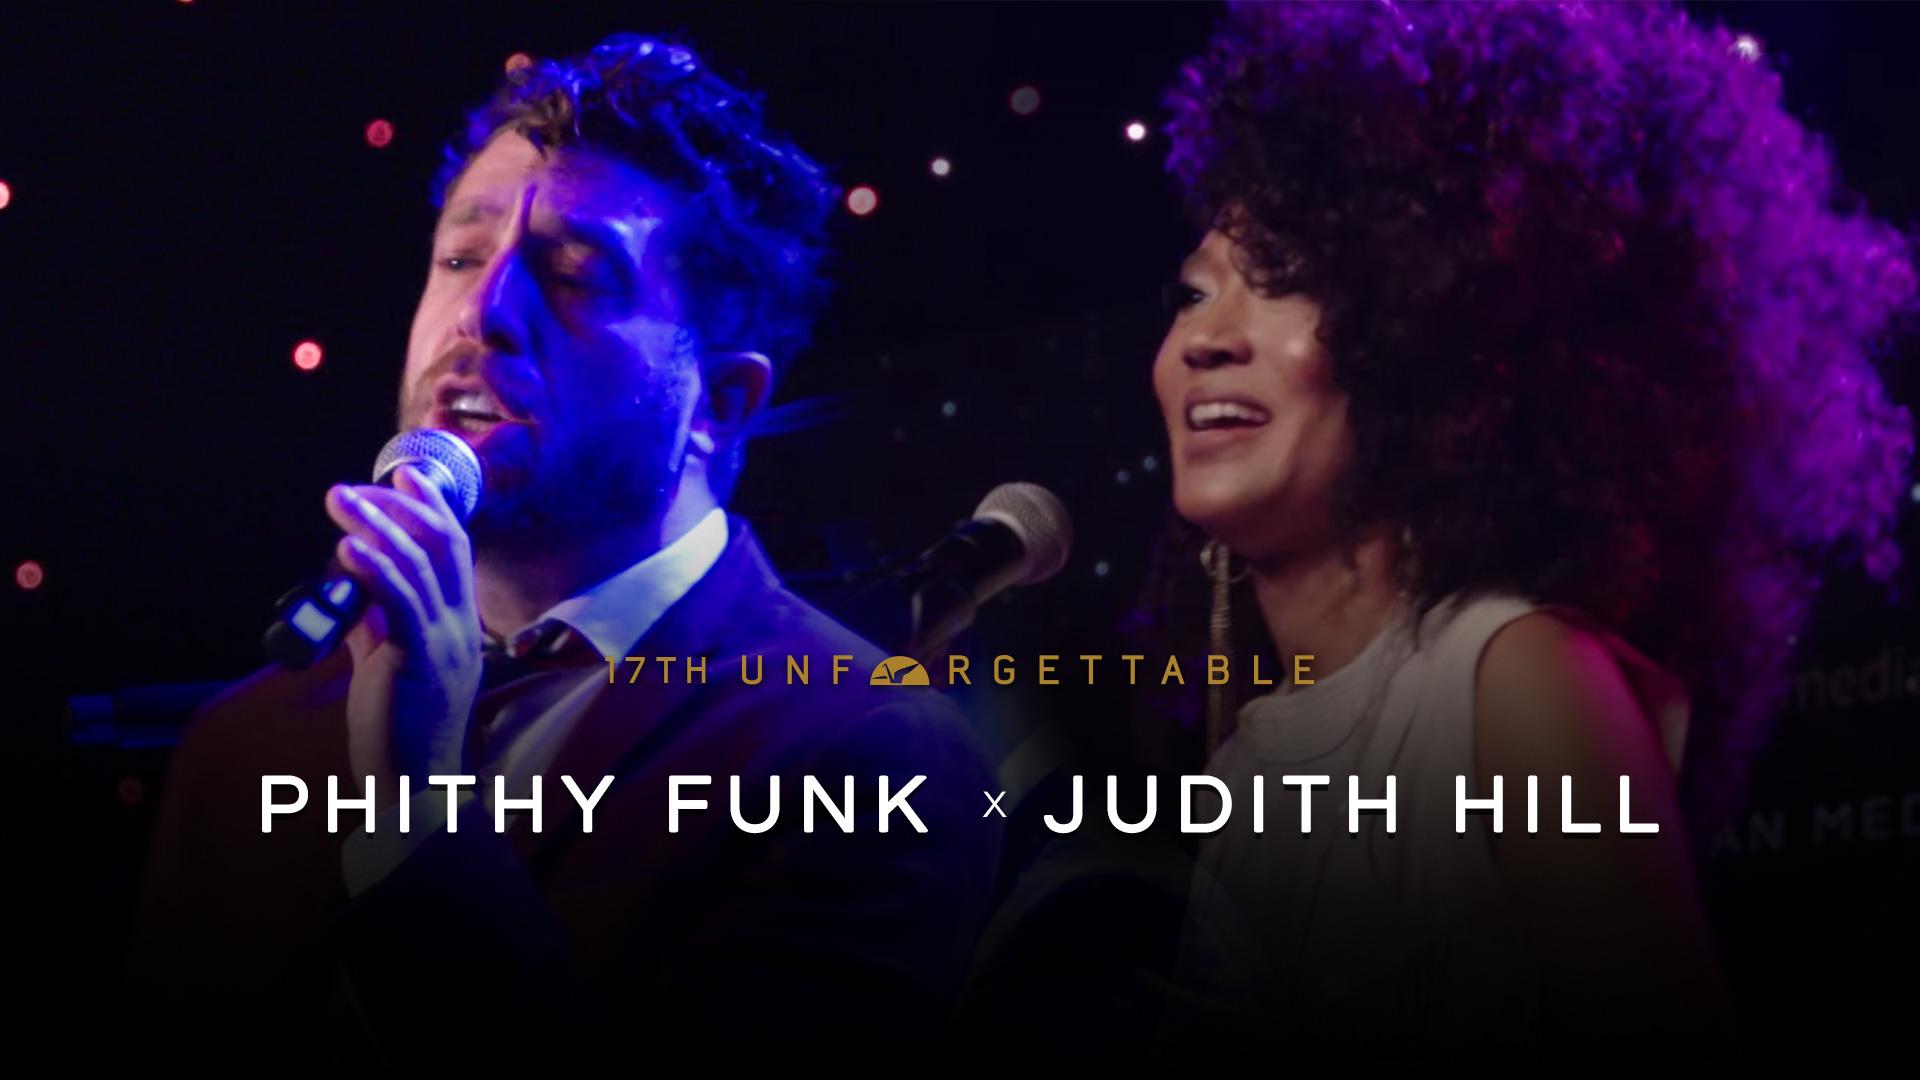 Philthy Funk x Judith Hill